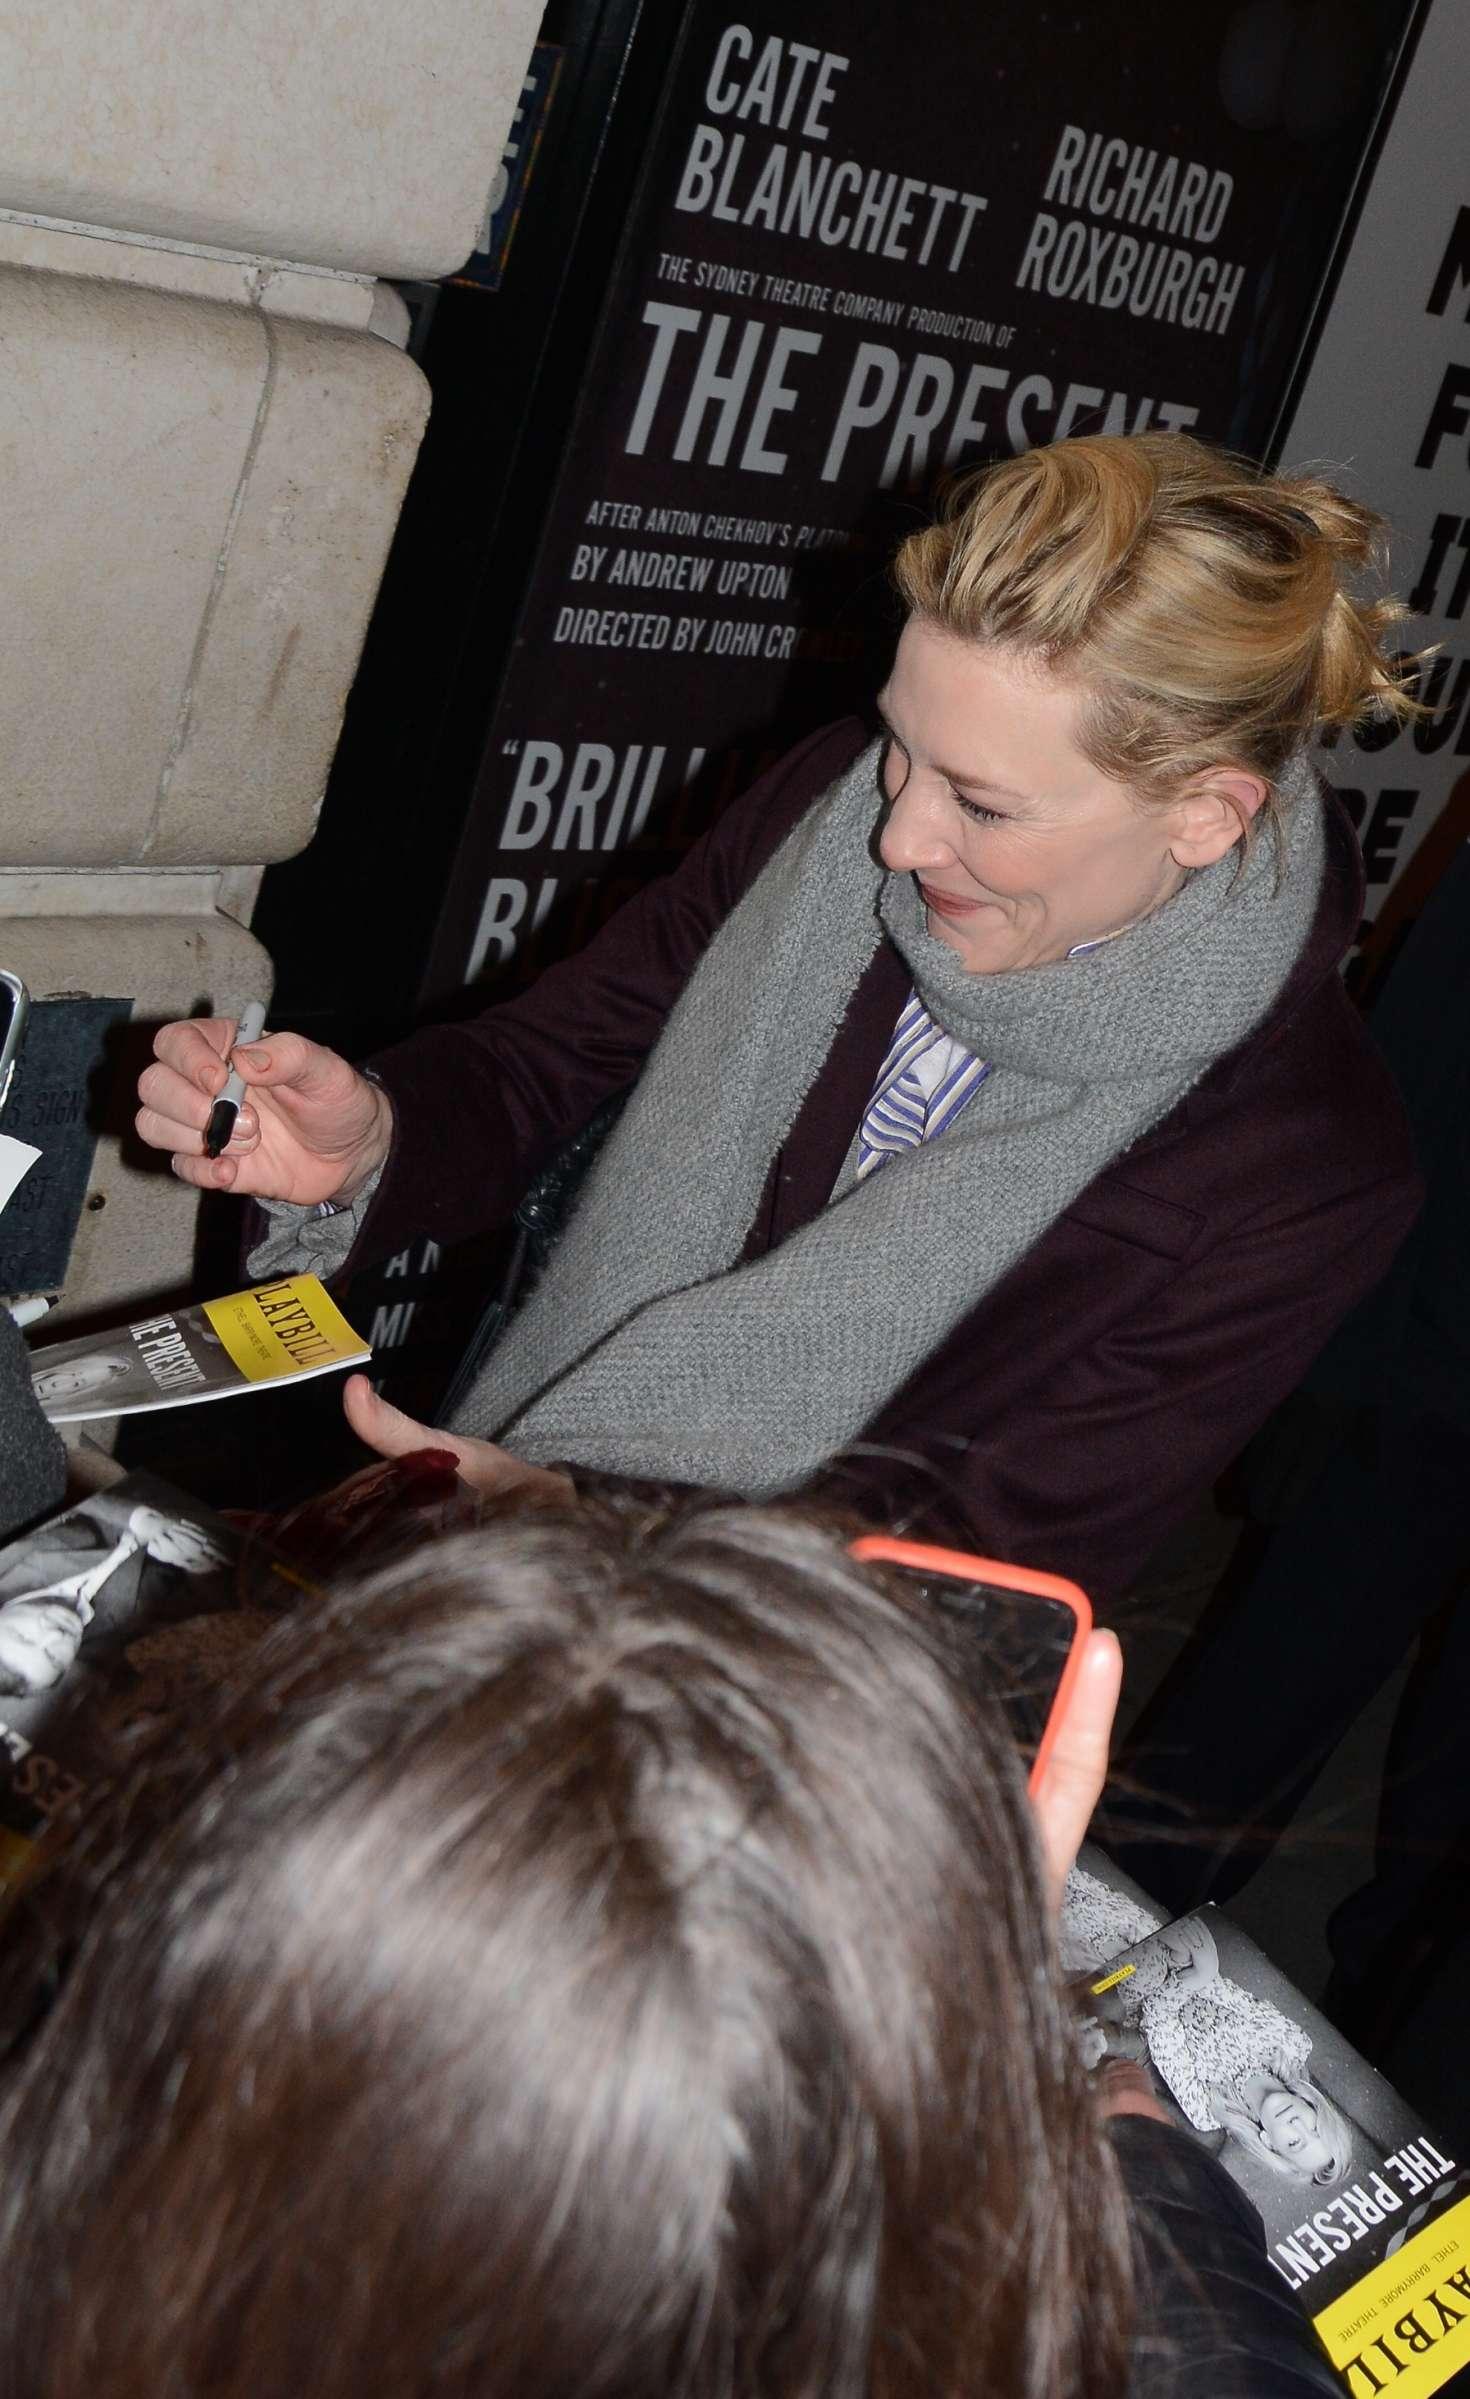 Cate Blanchett 2017 : Cate Blanchett: Meets fans after her broadway performance -07